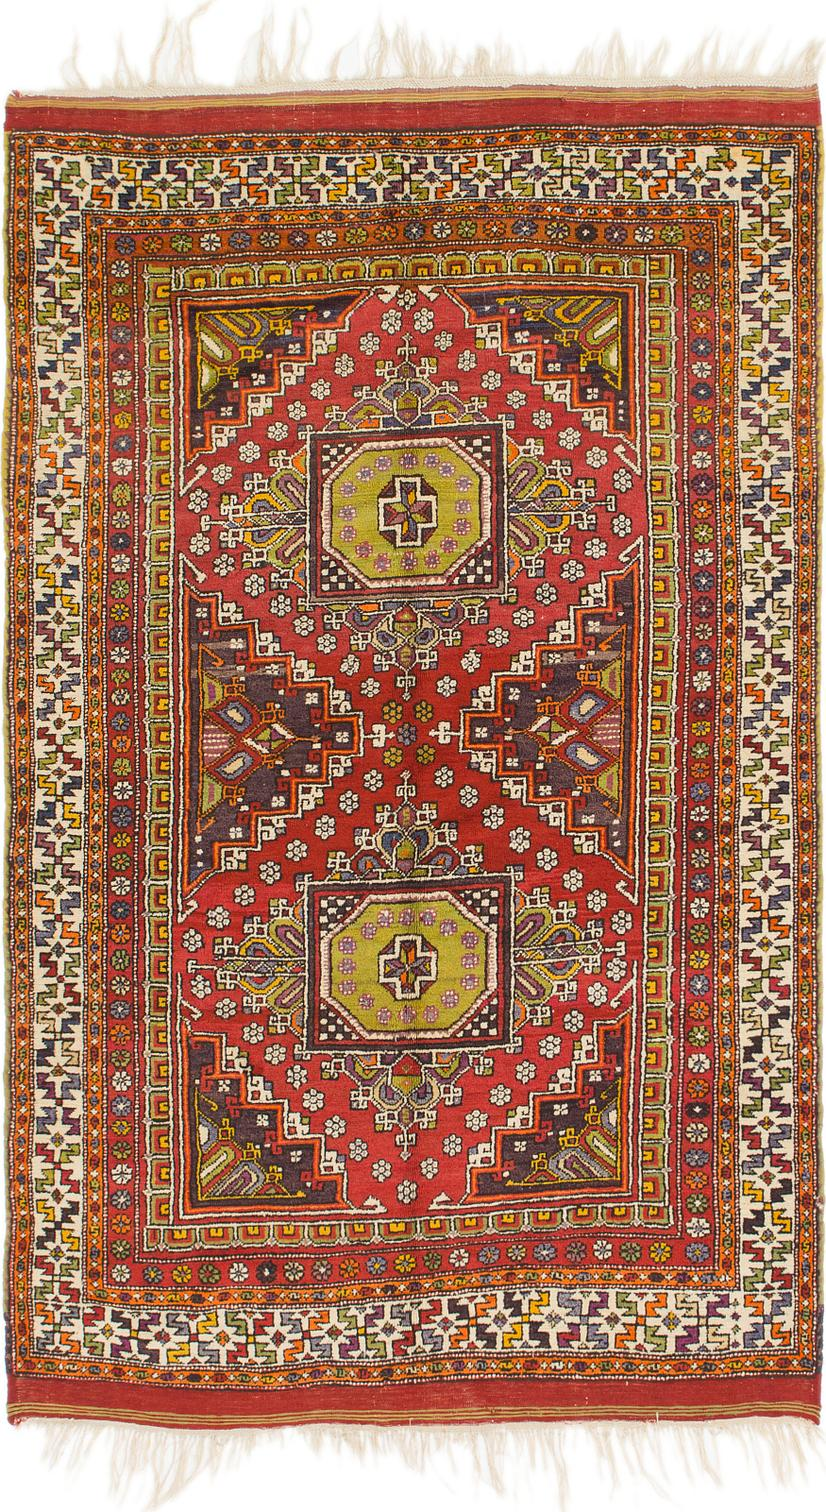 Main Handknotted 5 4 X 8 6 Anatolian Oriental Rug Photo